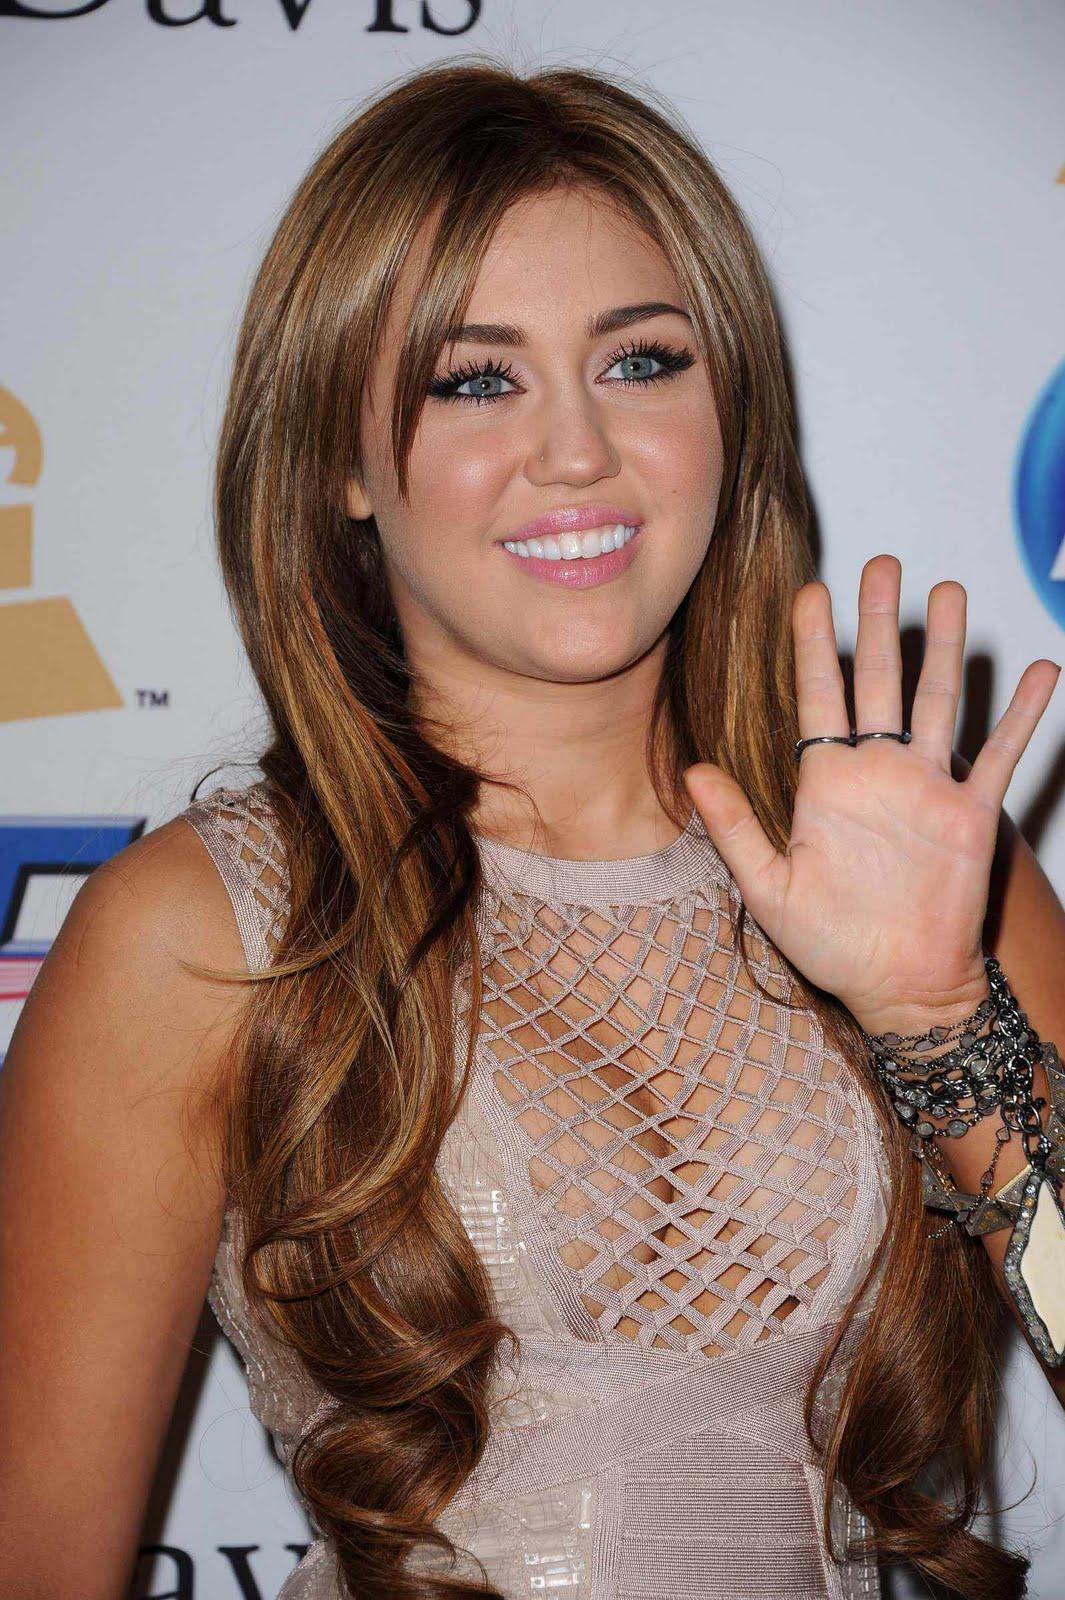 http://4.bp.blogspot.com/-HNMCTDaHUQU/Thcb1vhz1cI/AAAAAAAAGQM/E0_GAb97oyI/s1600/Miley-Cyrus-24.jpg